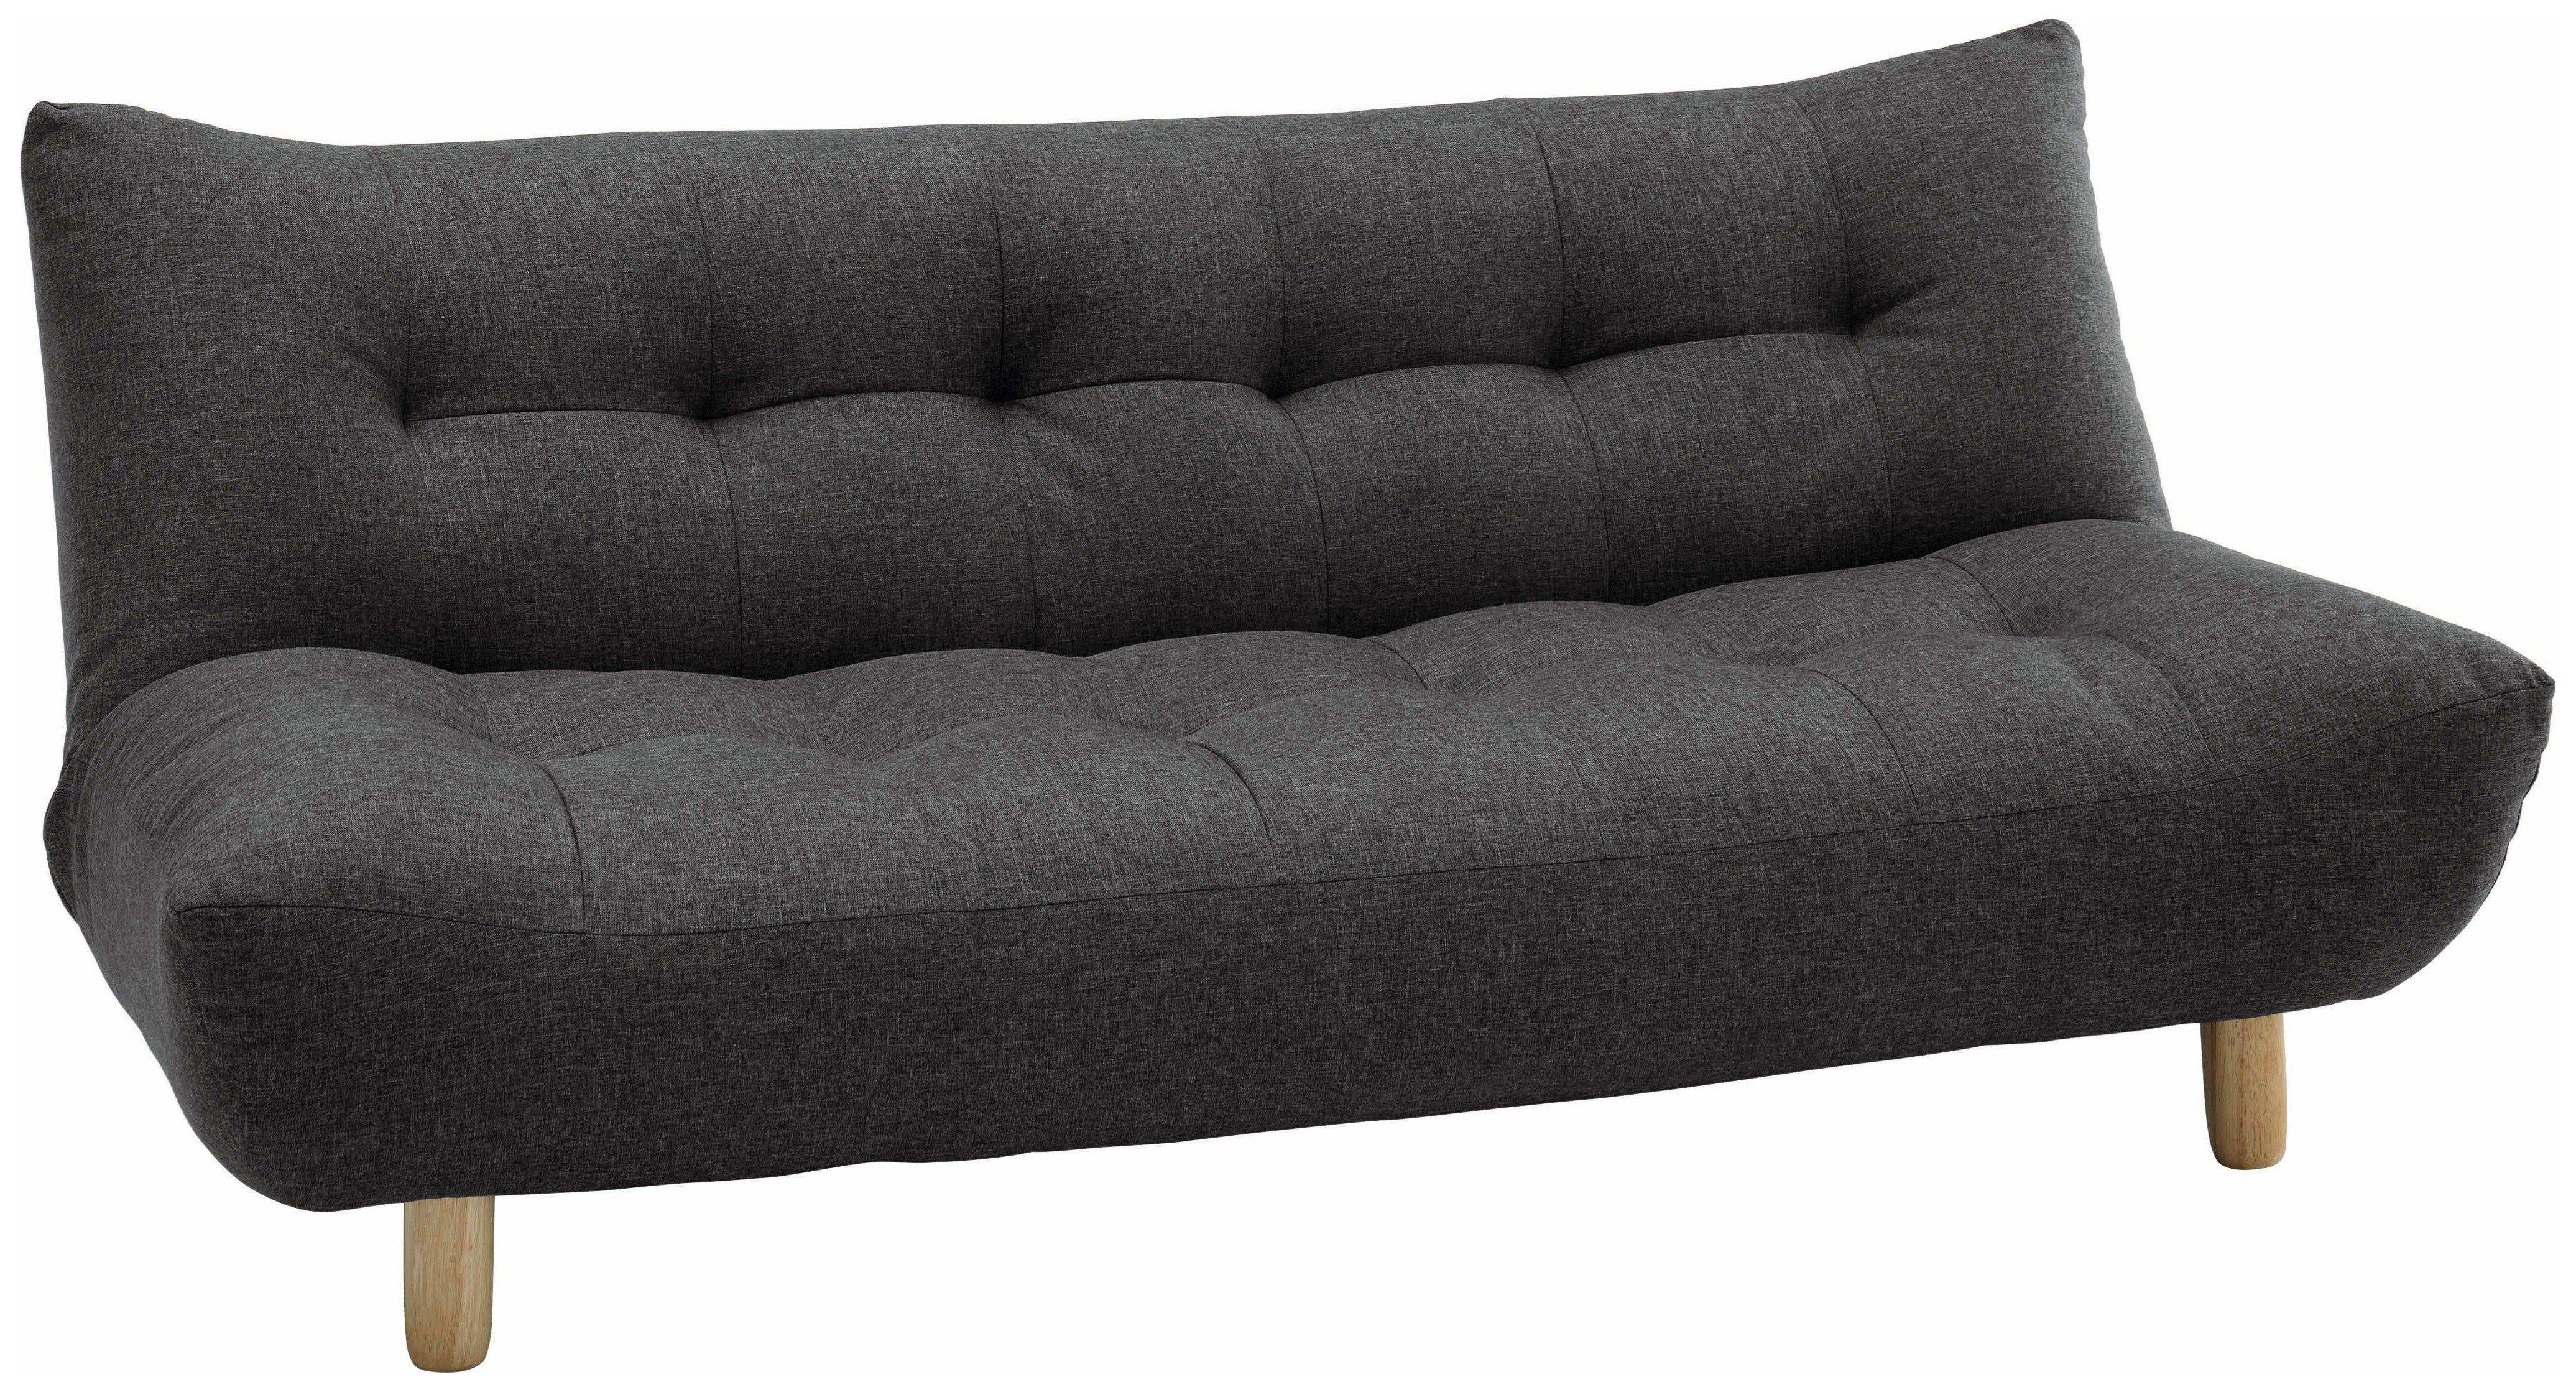 Habitat Sofas buy habitat kota 2 seater fabric sofa bed charcoal at argos co uk